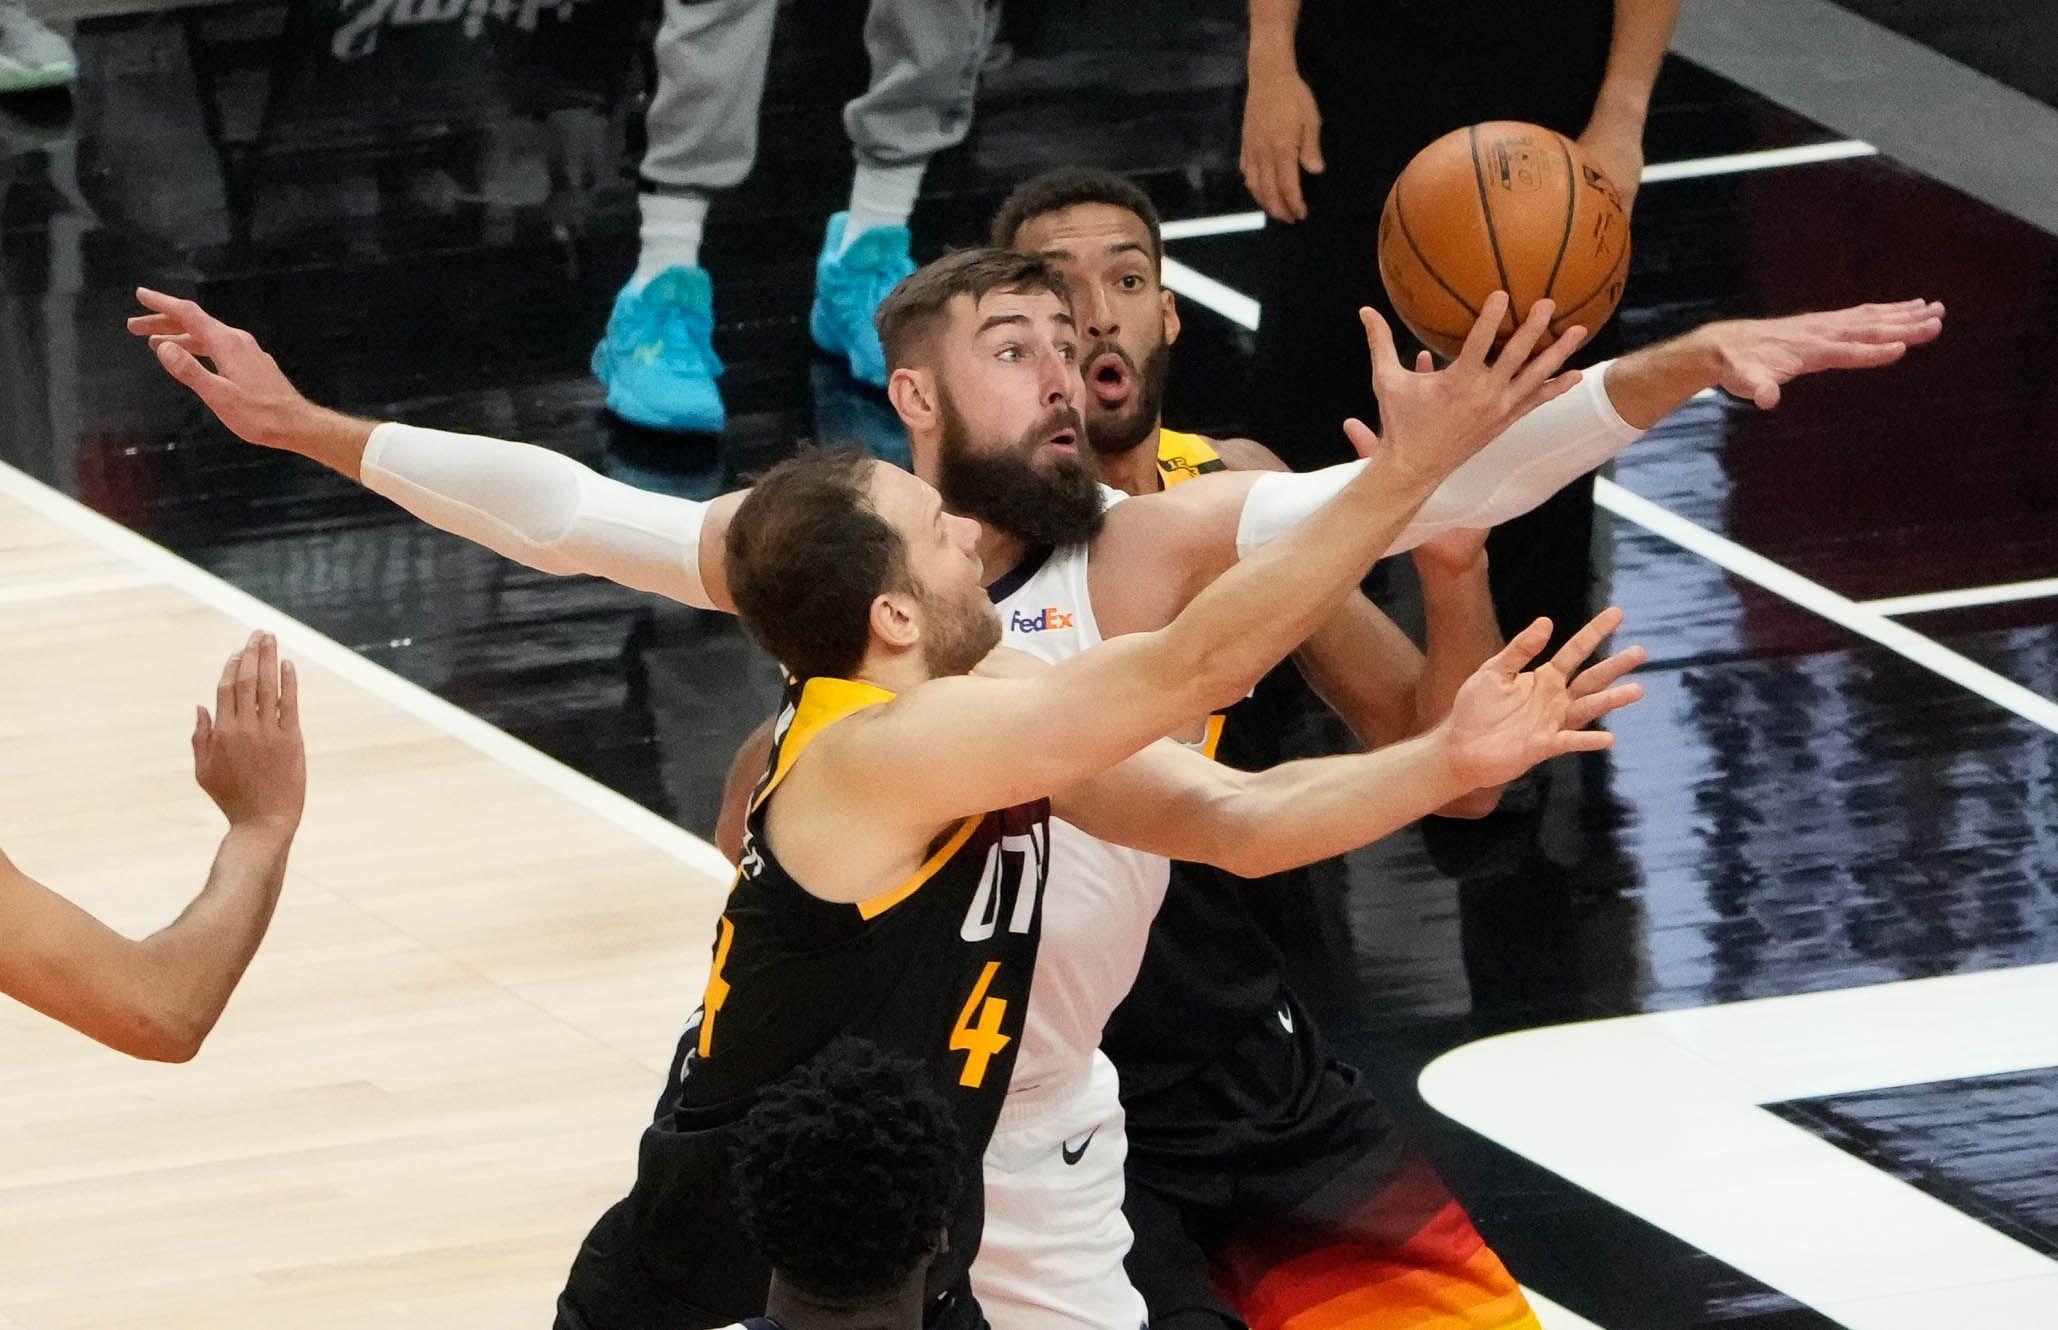 (Francisco Kjolseth | The Salt Lake Tribune) Memphis Grizzlies center Jonas Valanciunas (17) tries to block Utah Jazz forward Bojan Bogdanovic (44) in the first half of Game 5 of an NBA basketball first-round playoff series Wednesday, June 2, 2021, in Salt Lake City, UT.